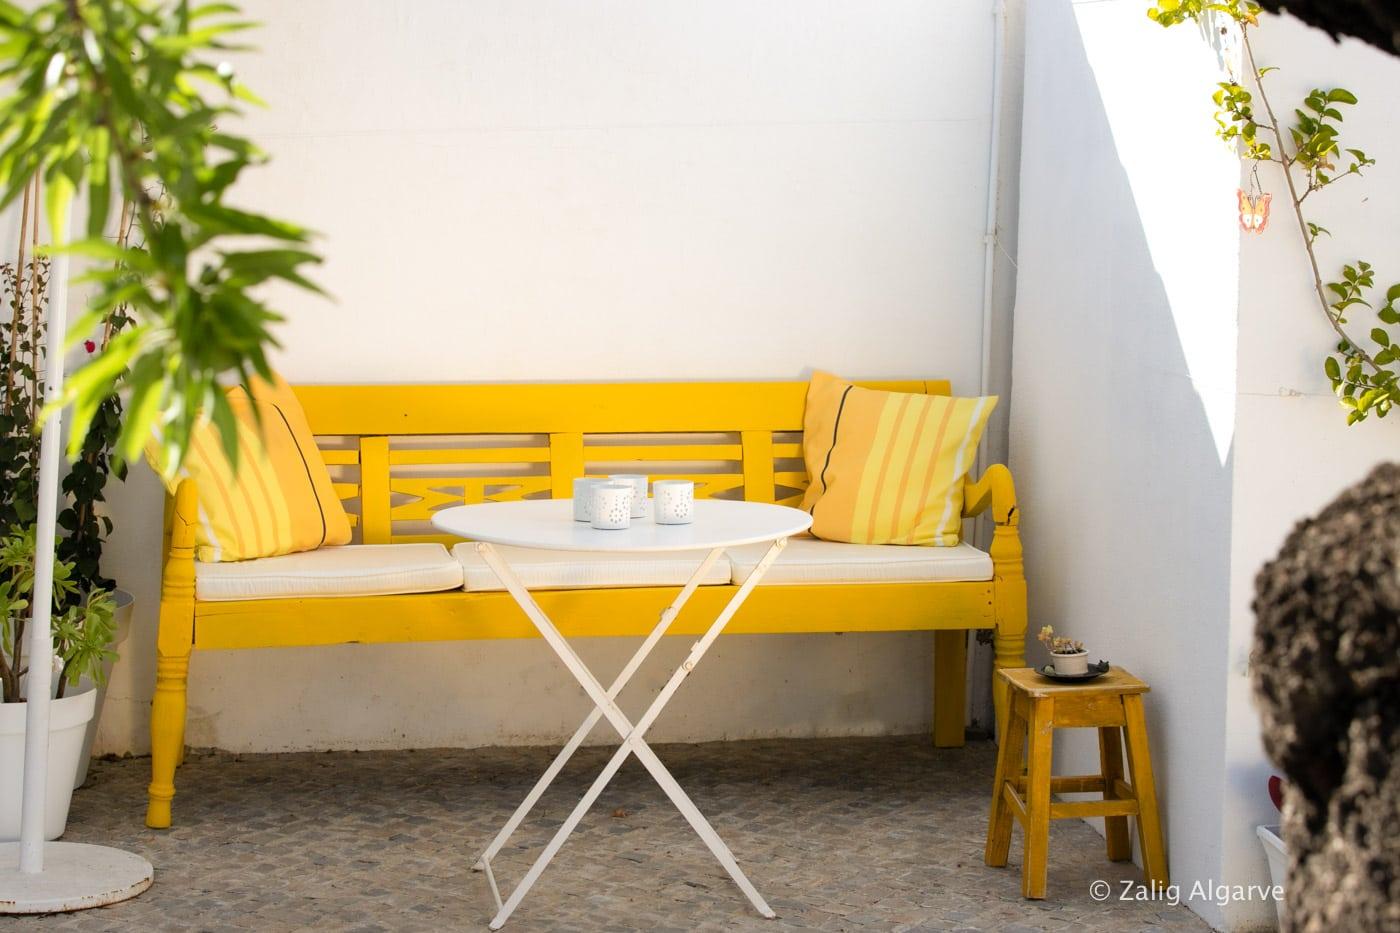 Casa-Alfarrobeira-Zalig-Algarve-65